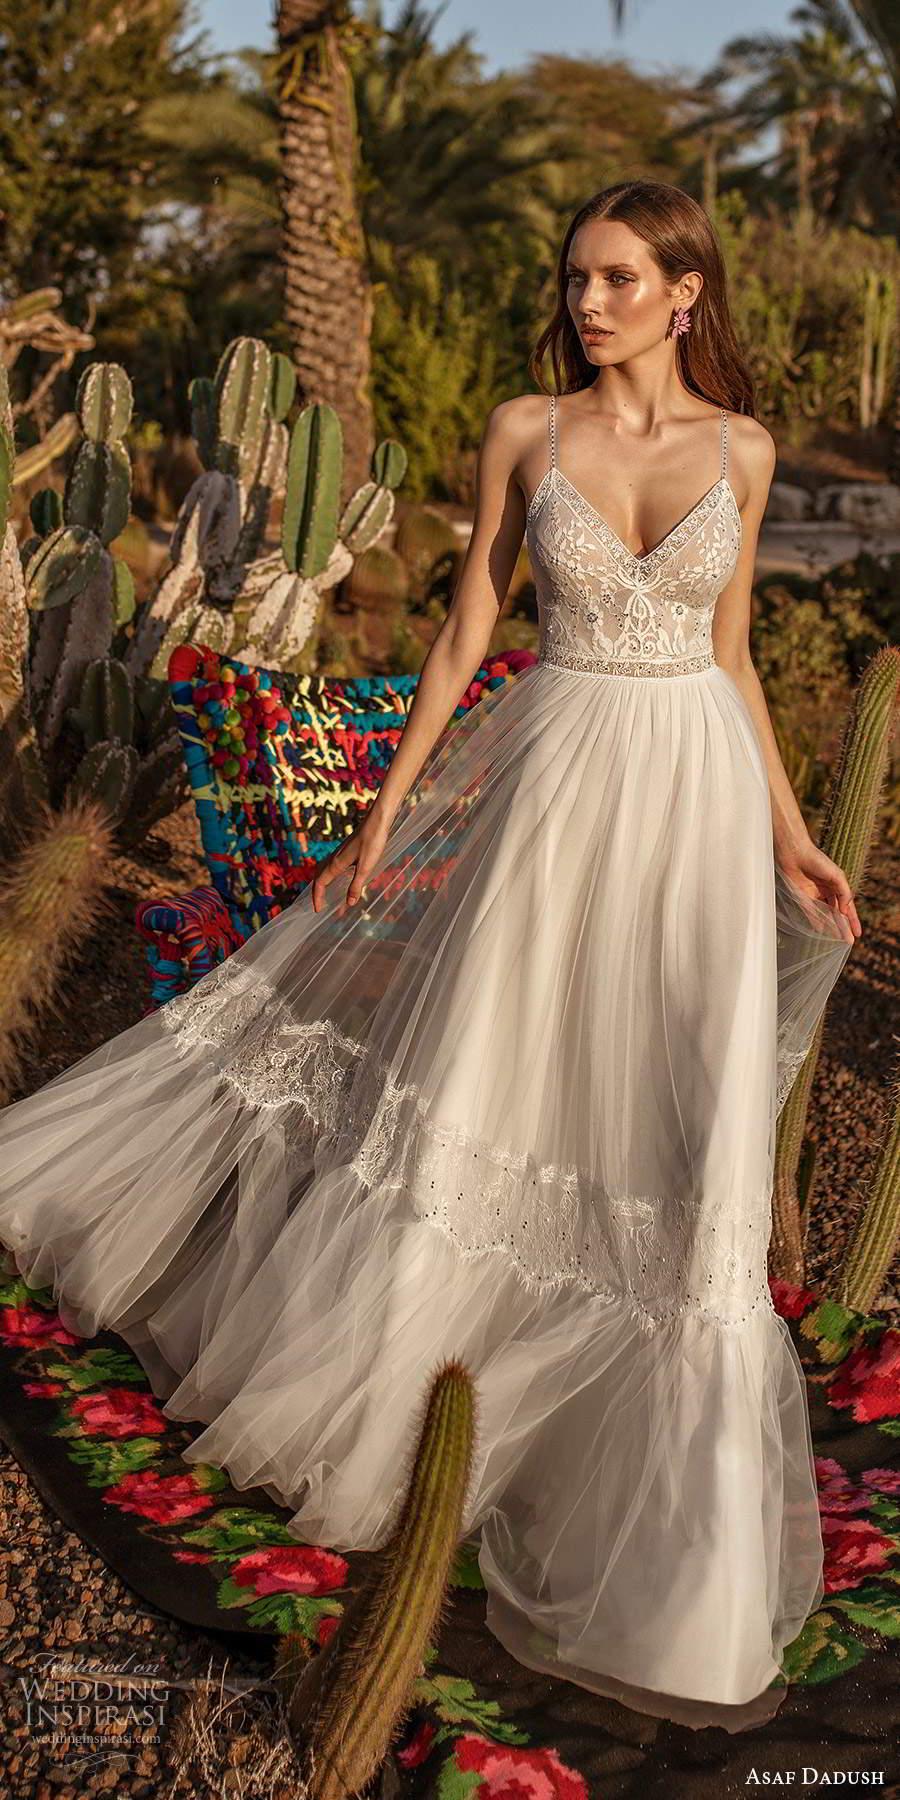 asaf dadush 2020 bridal sleeveless thin beaded straps v neckline embellished bodice a line ball gown wedding dress open back (11) mv